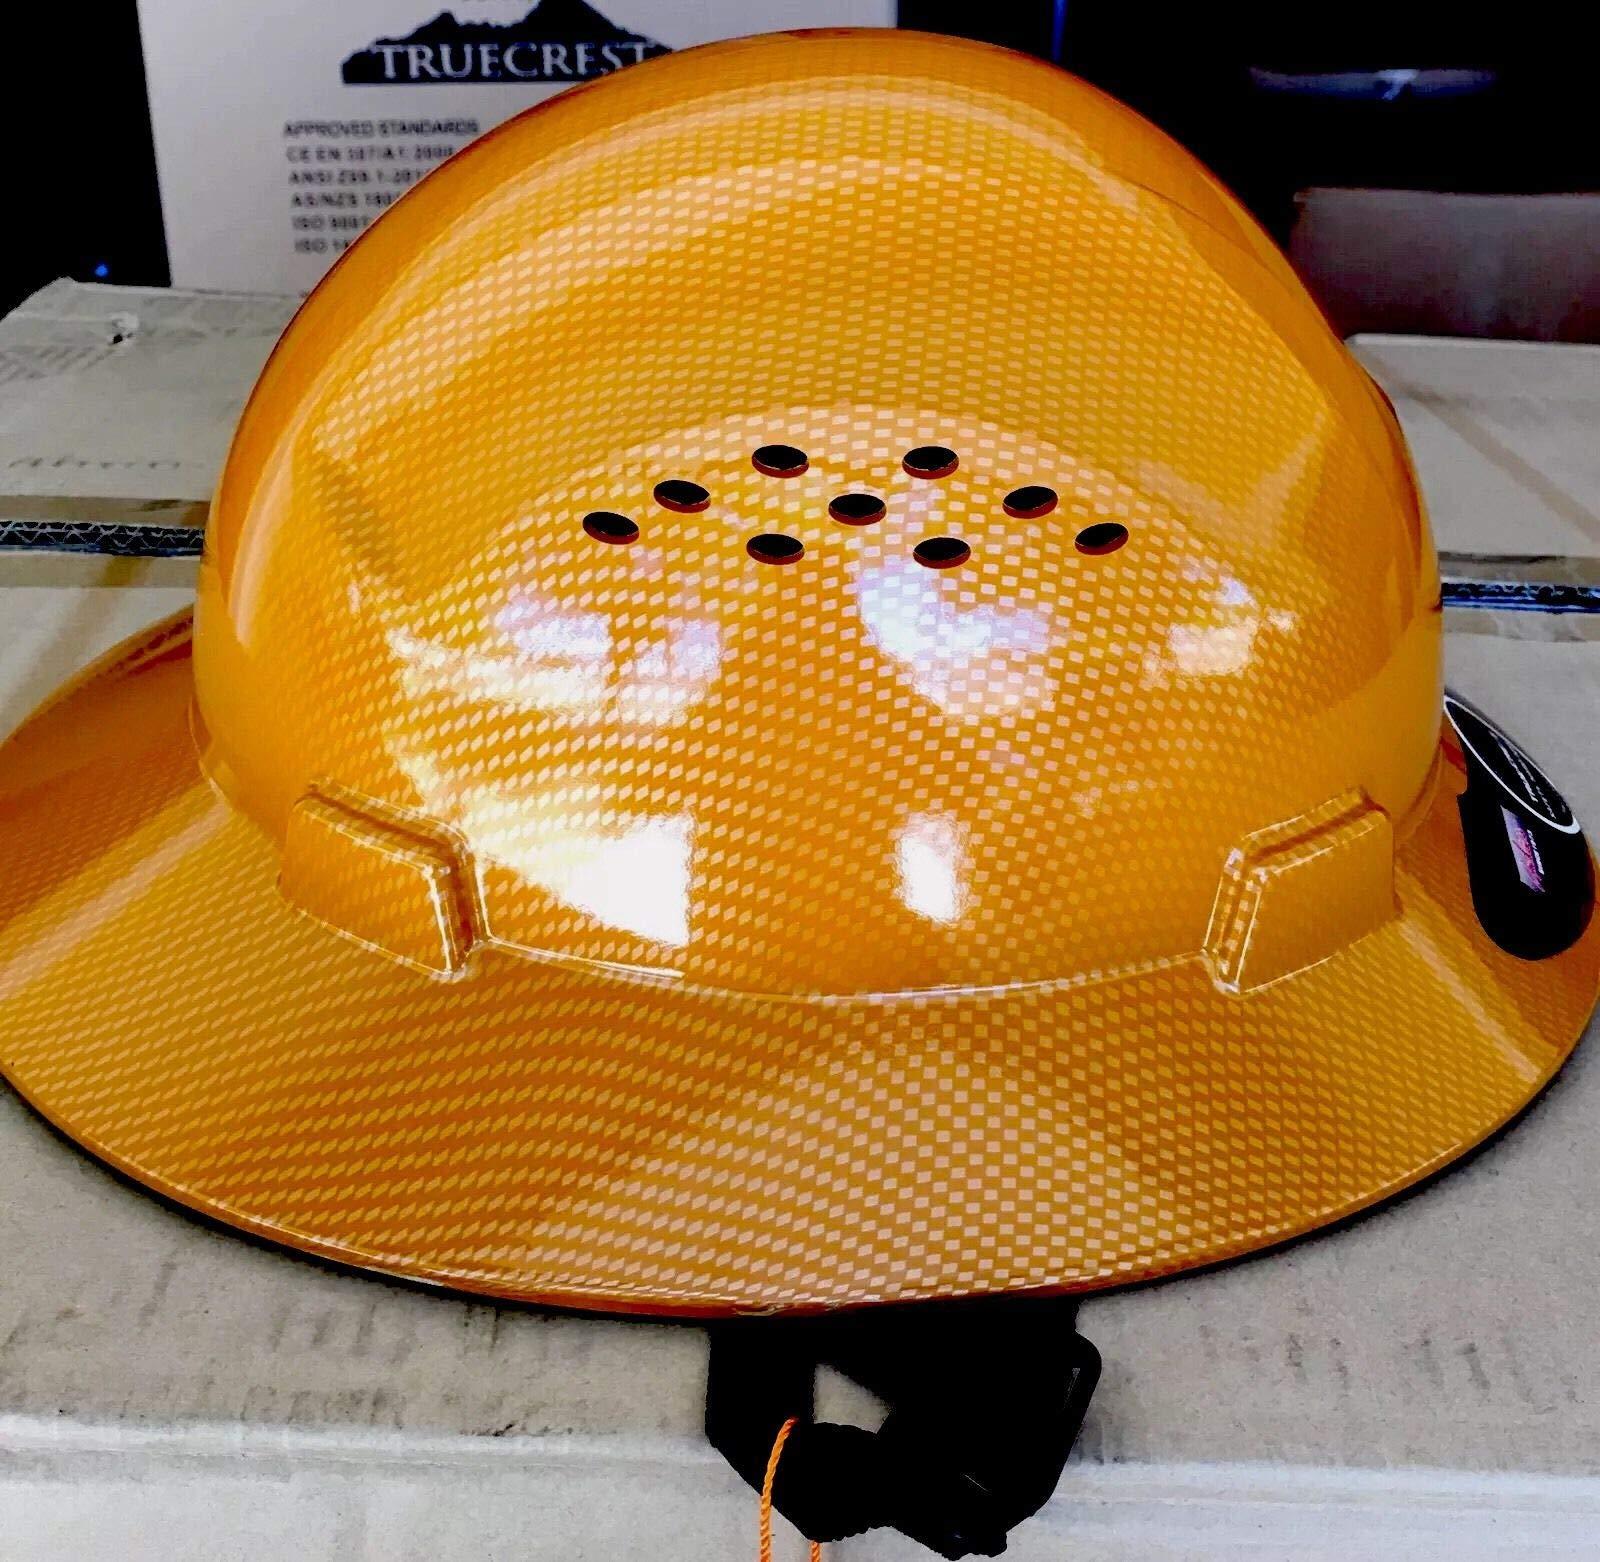 HNTE-TAN Fiberglass Hard Hat Safety Full Brim Helmet, Nylon Ratchet Suspension, 4-Point, {Top Impact} Safety Hard Hat Cool Air Flow Vent System by Truecrest Safety Helmet (Image #2)